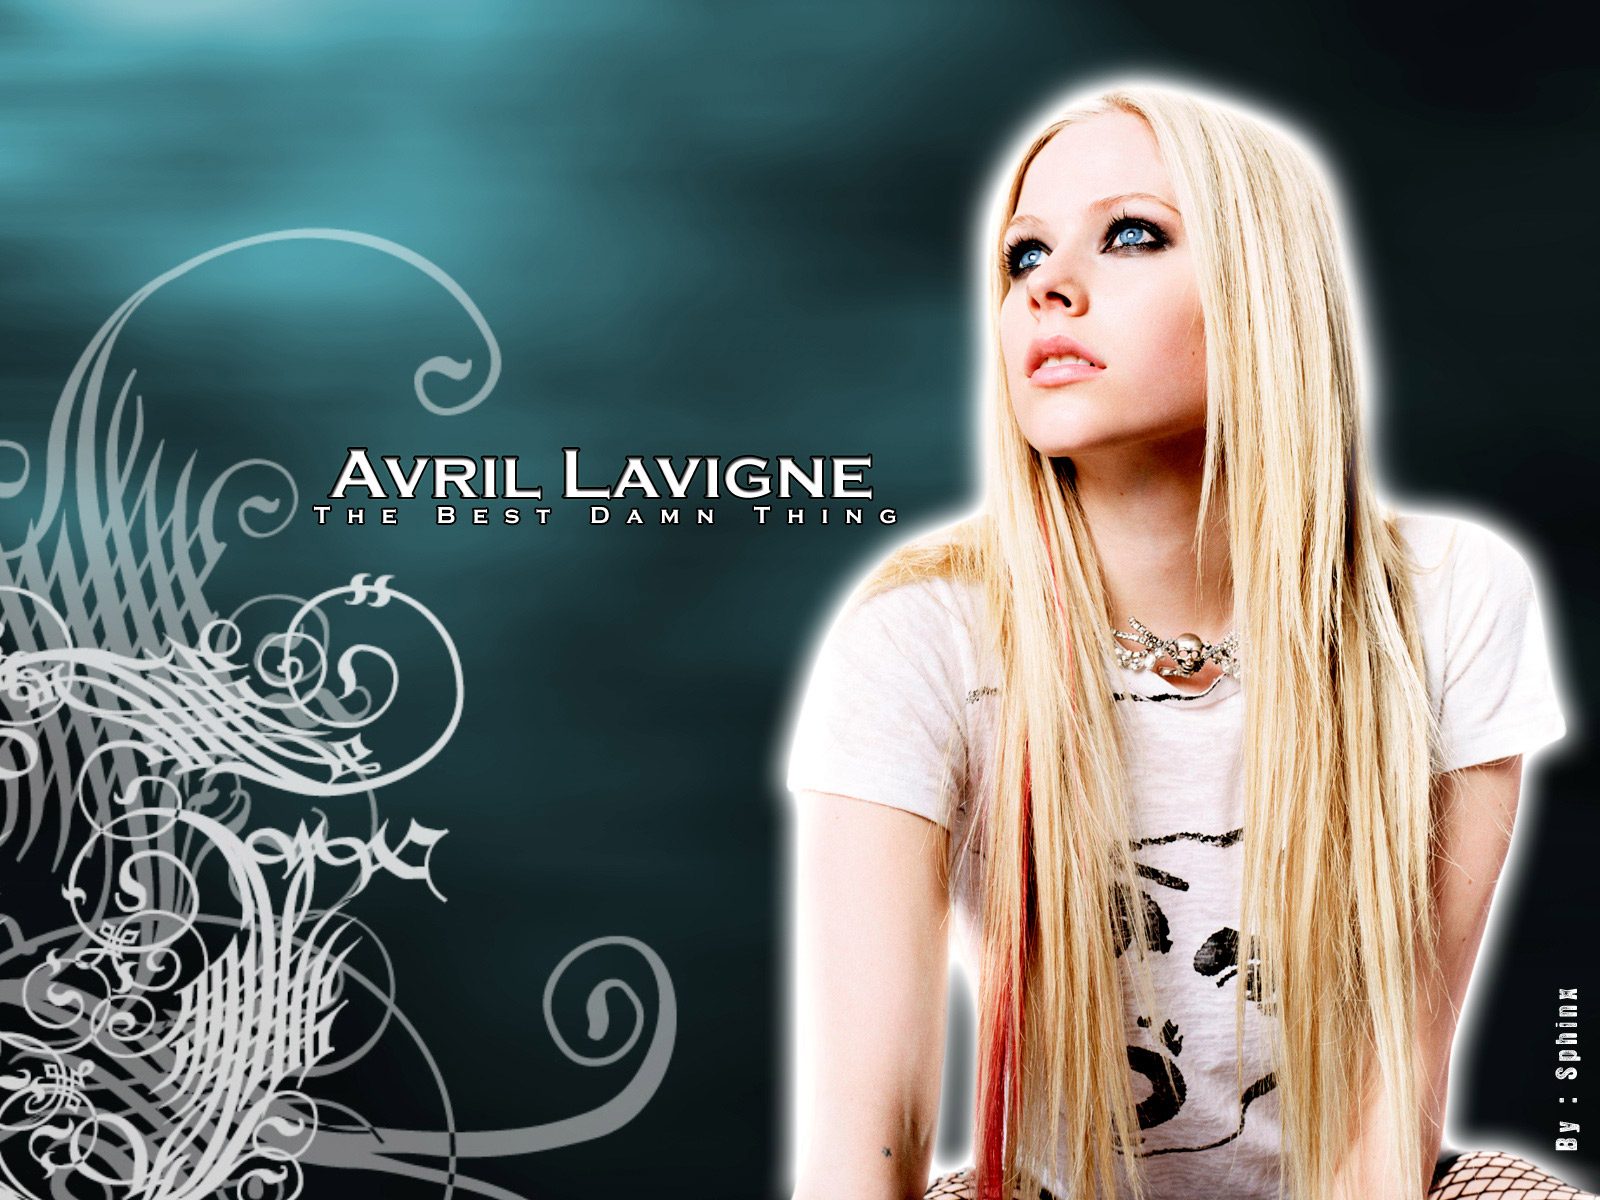 http://1.bp.blogspot.com/-05NiiBxPT8E/TooAPVvIF8I/AAAAAAAAAM8/N7zICSY8xB4/s1600/Avril_Lavigne%252C_The_Best_Damn_Thing.jpg